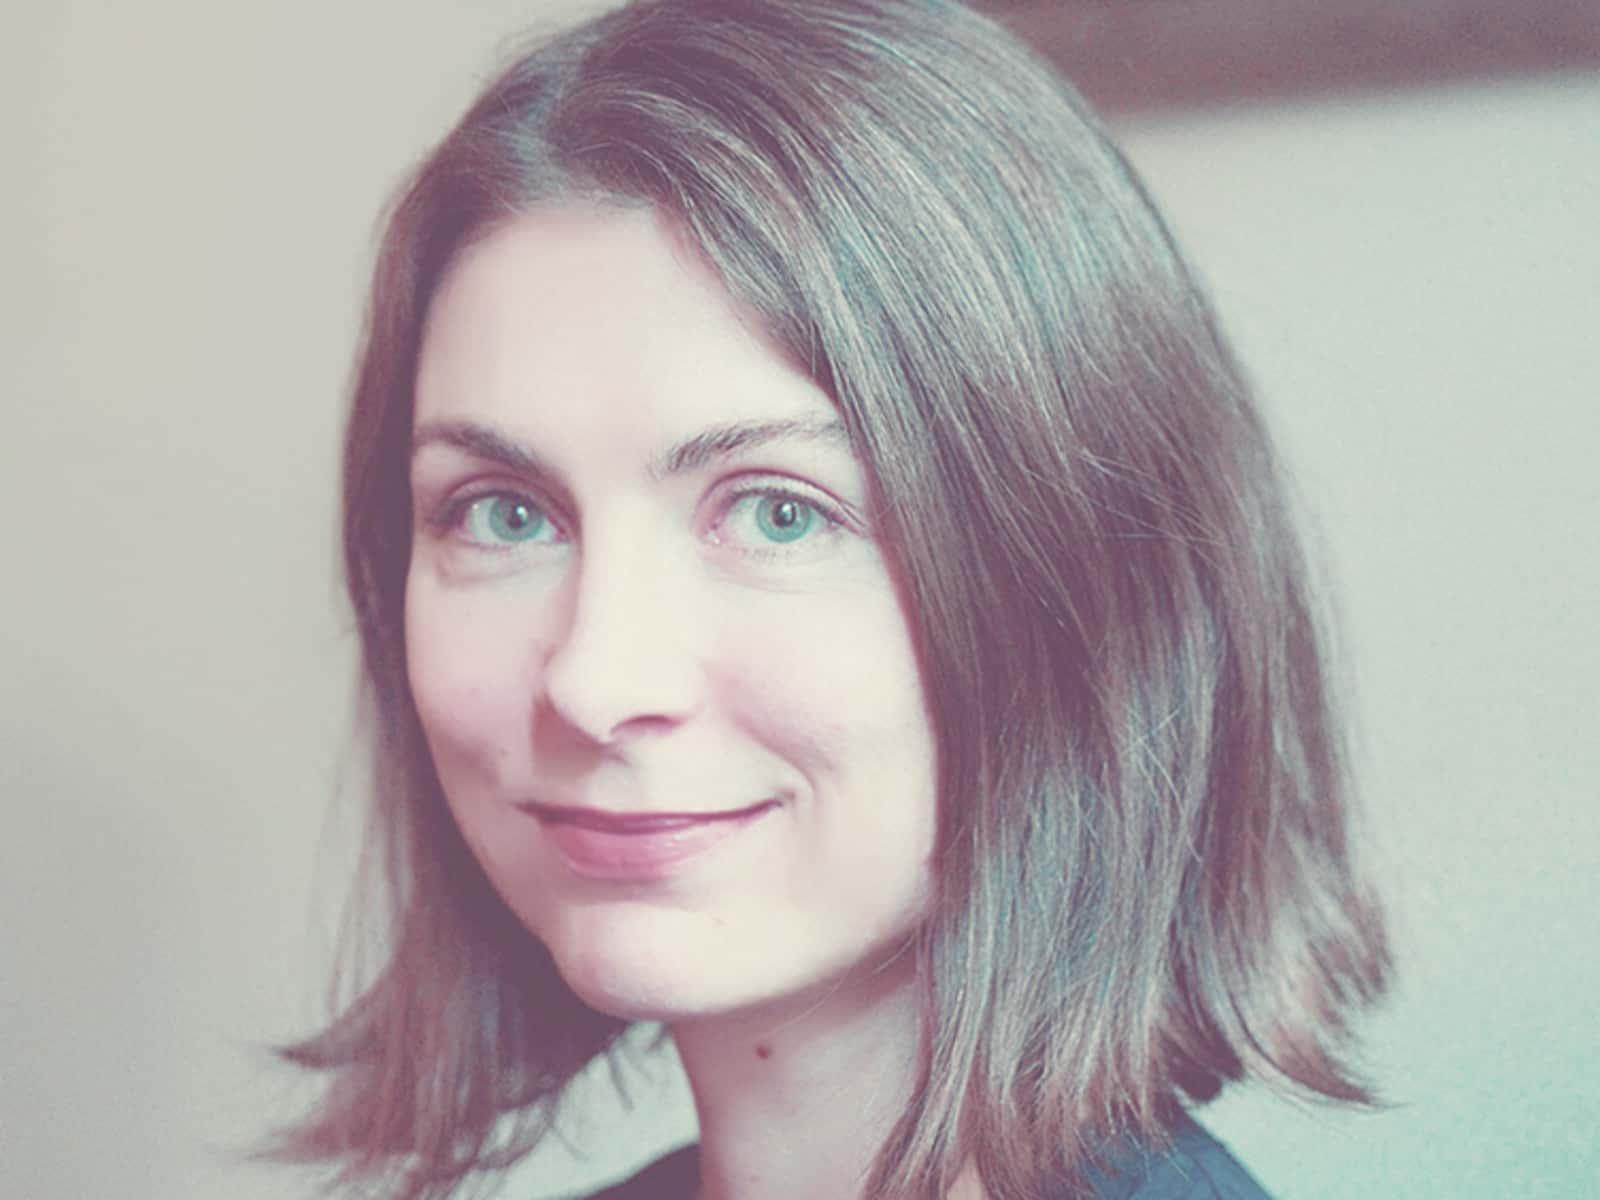 Lara from London, United Kingdom